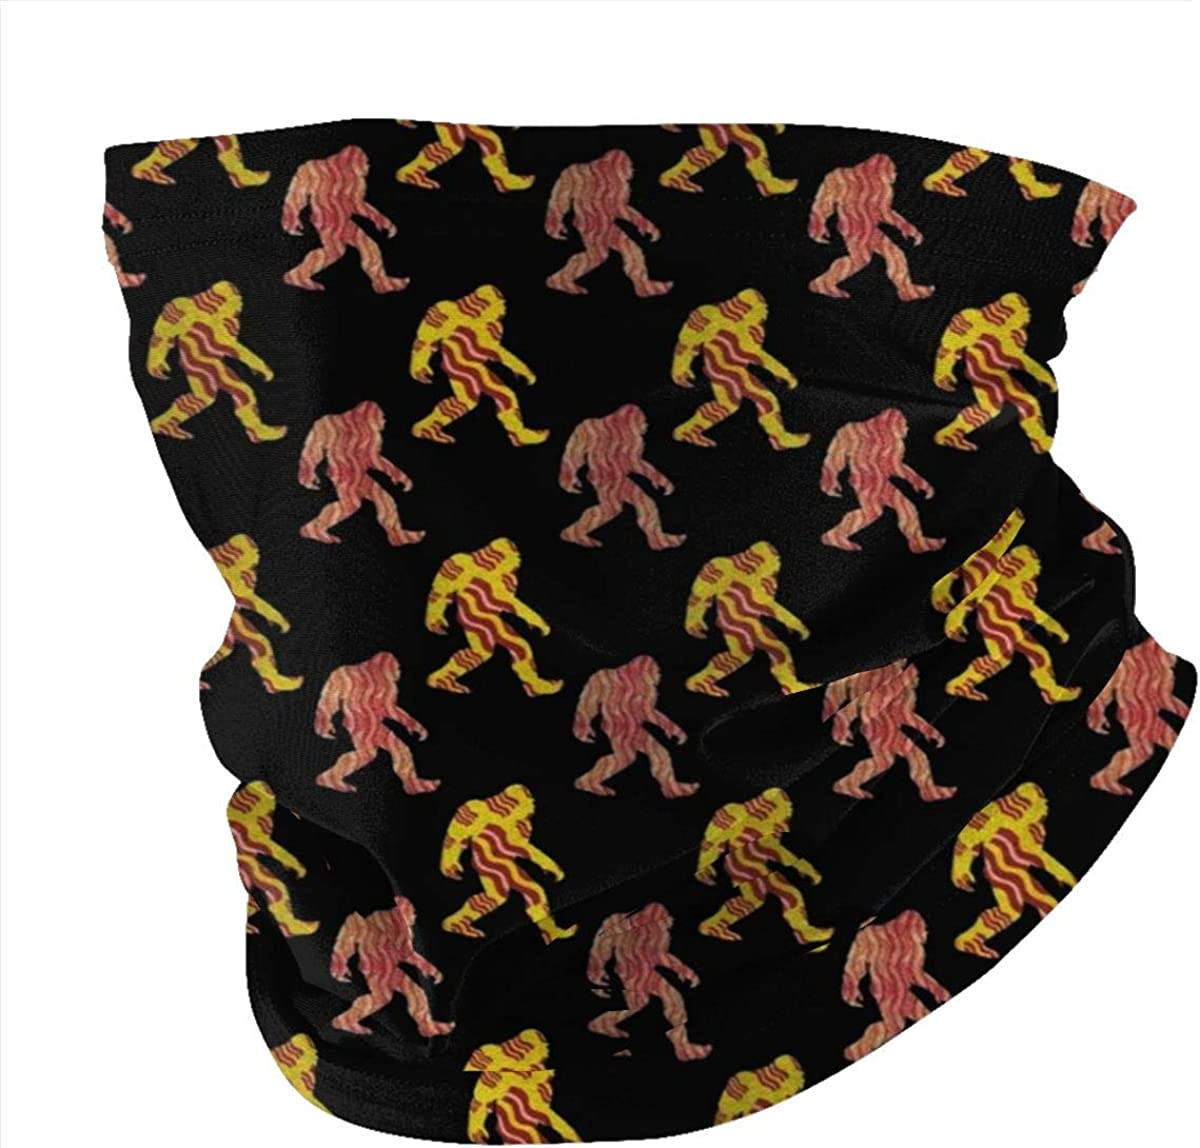 Bigfoot Sasquatch Bacon Face Mask Bandana for Dust Headband Magic Scarf Head Wrap Neck Warmer Black